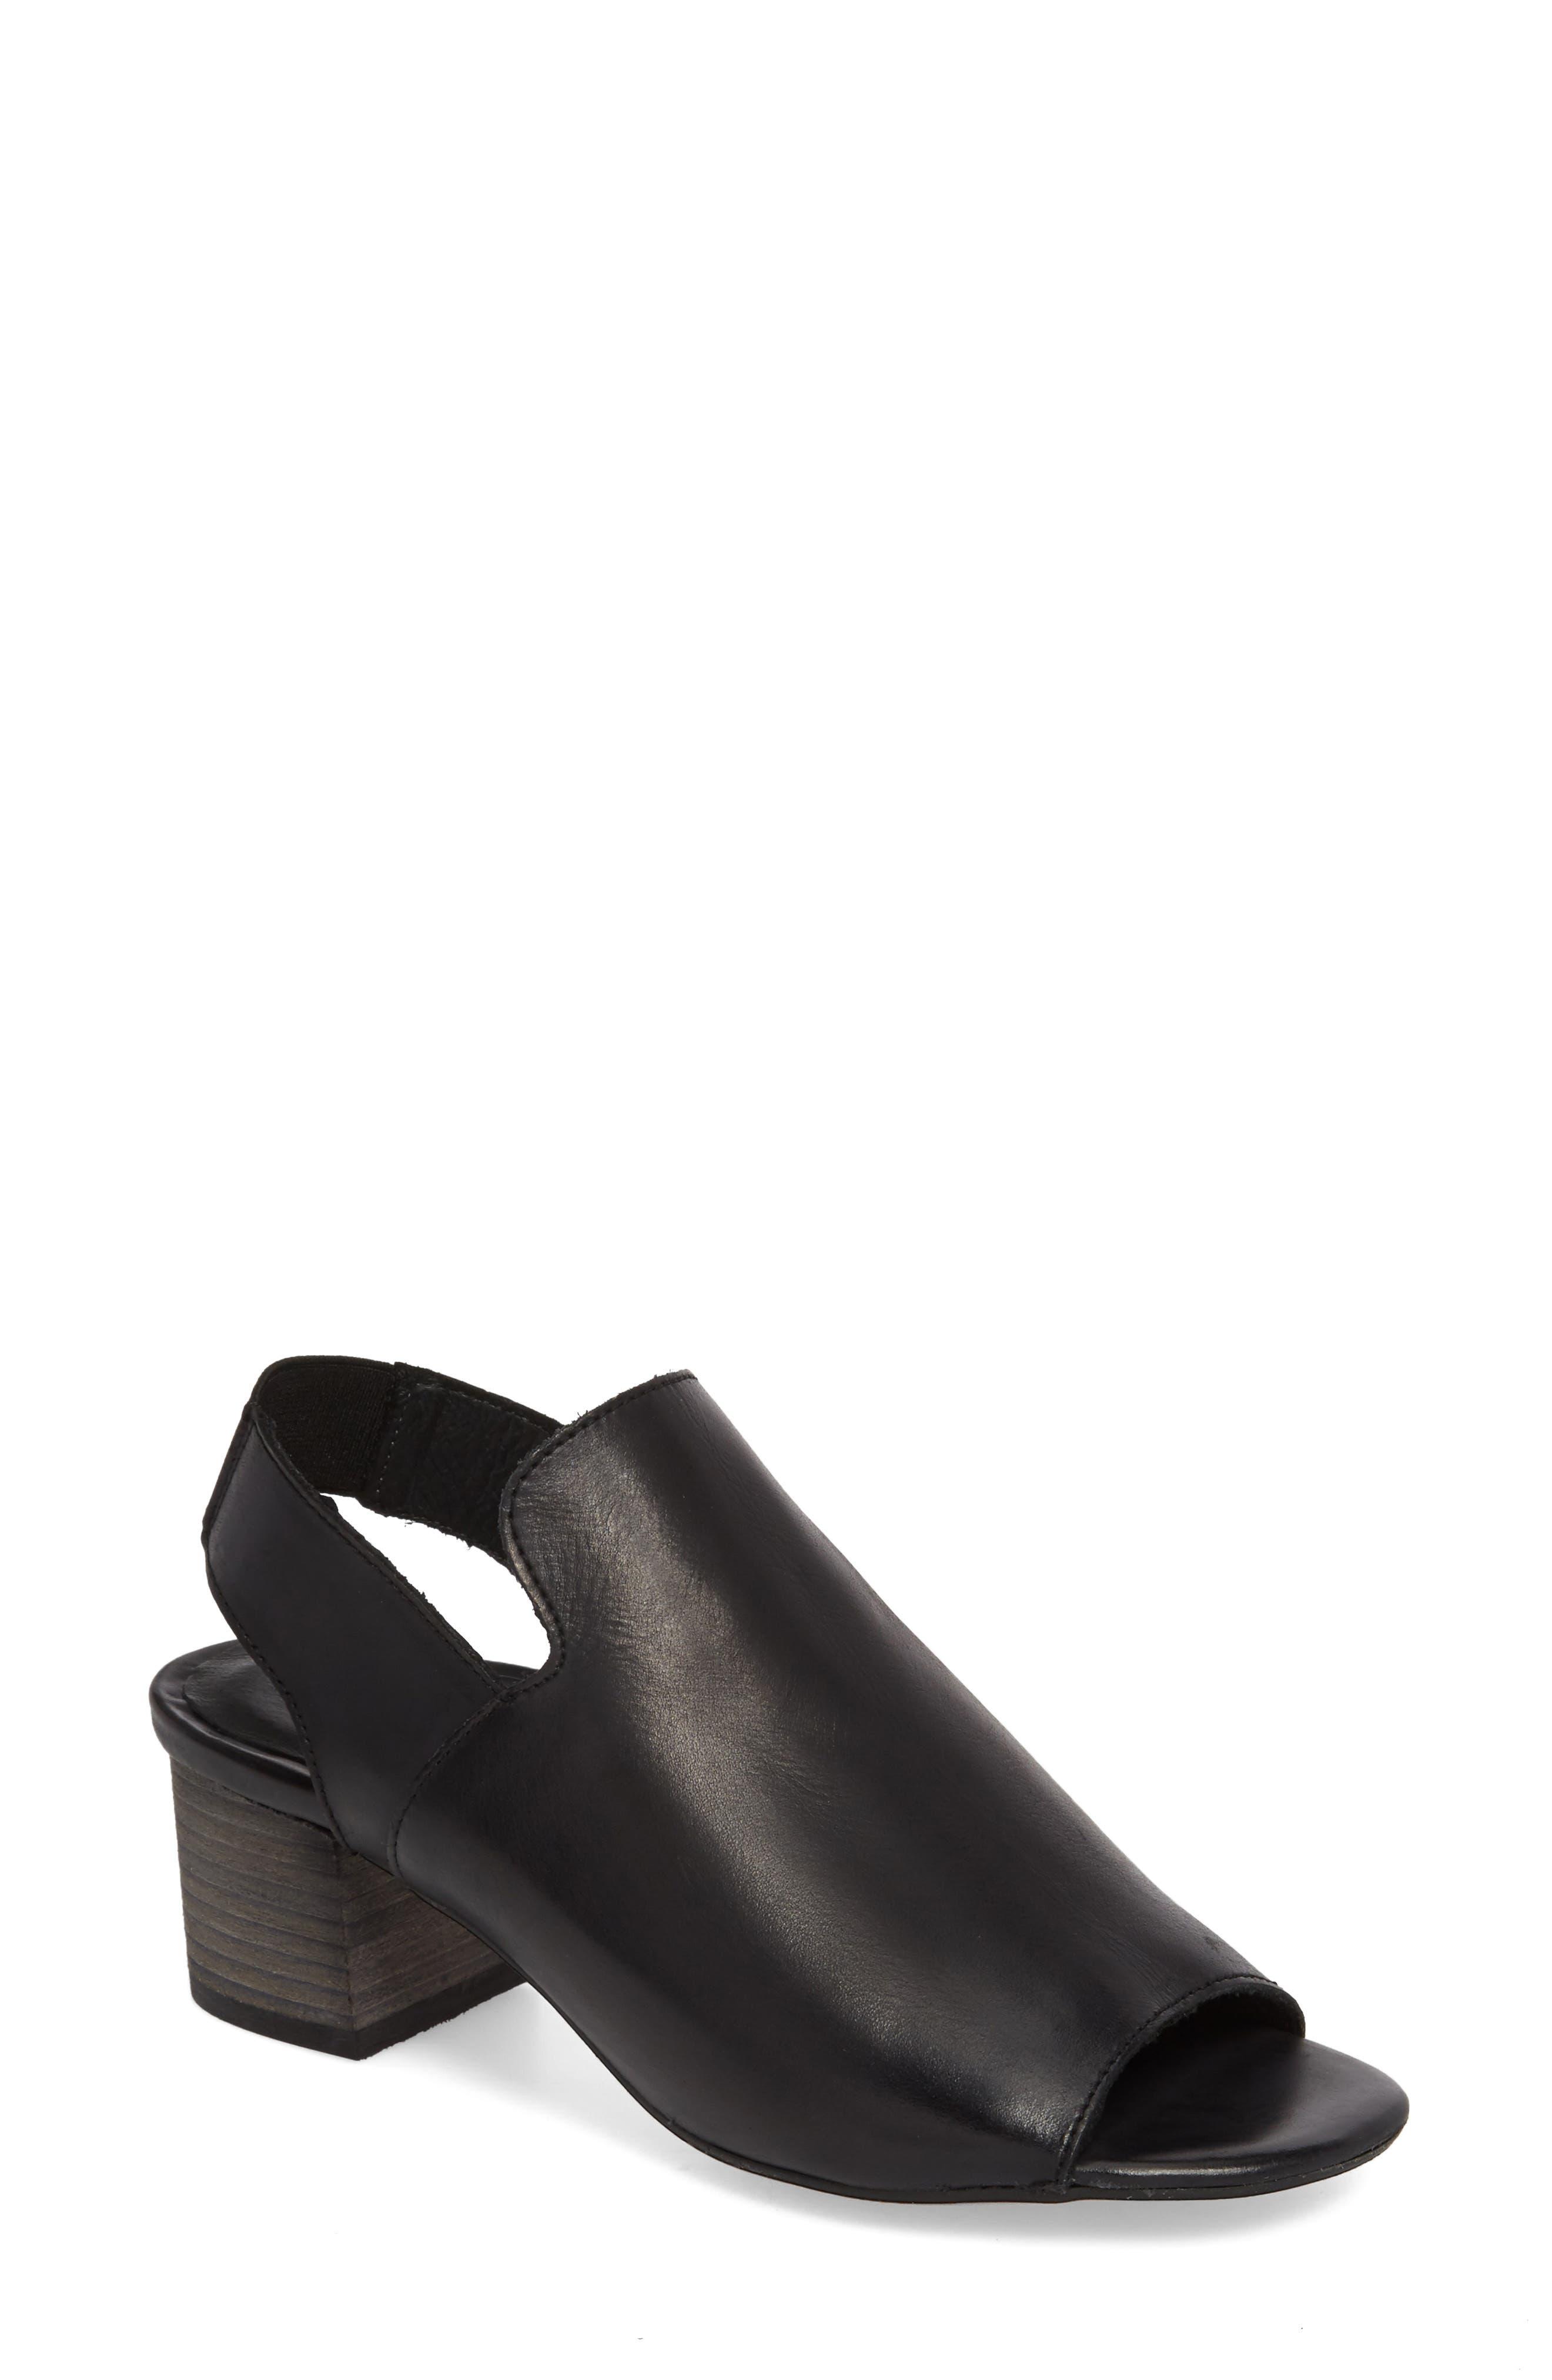 BOS. & CO. Zaire Slingback Sandal, Main, color, BLACK GLAMOUR LEATHER